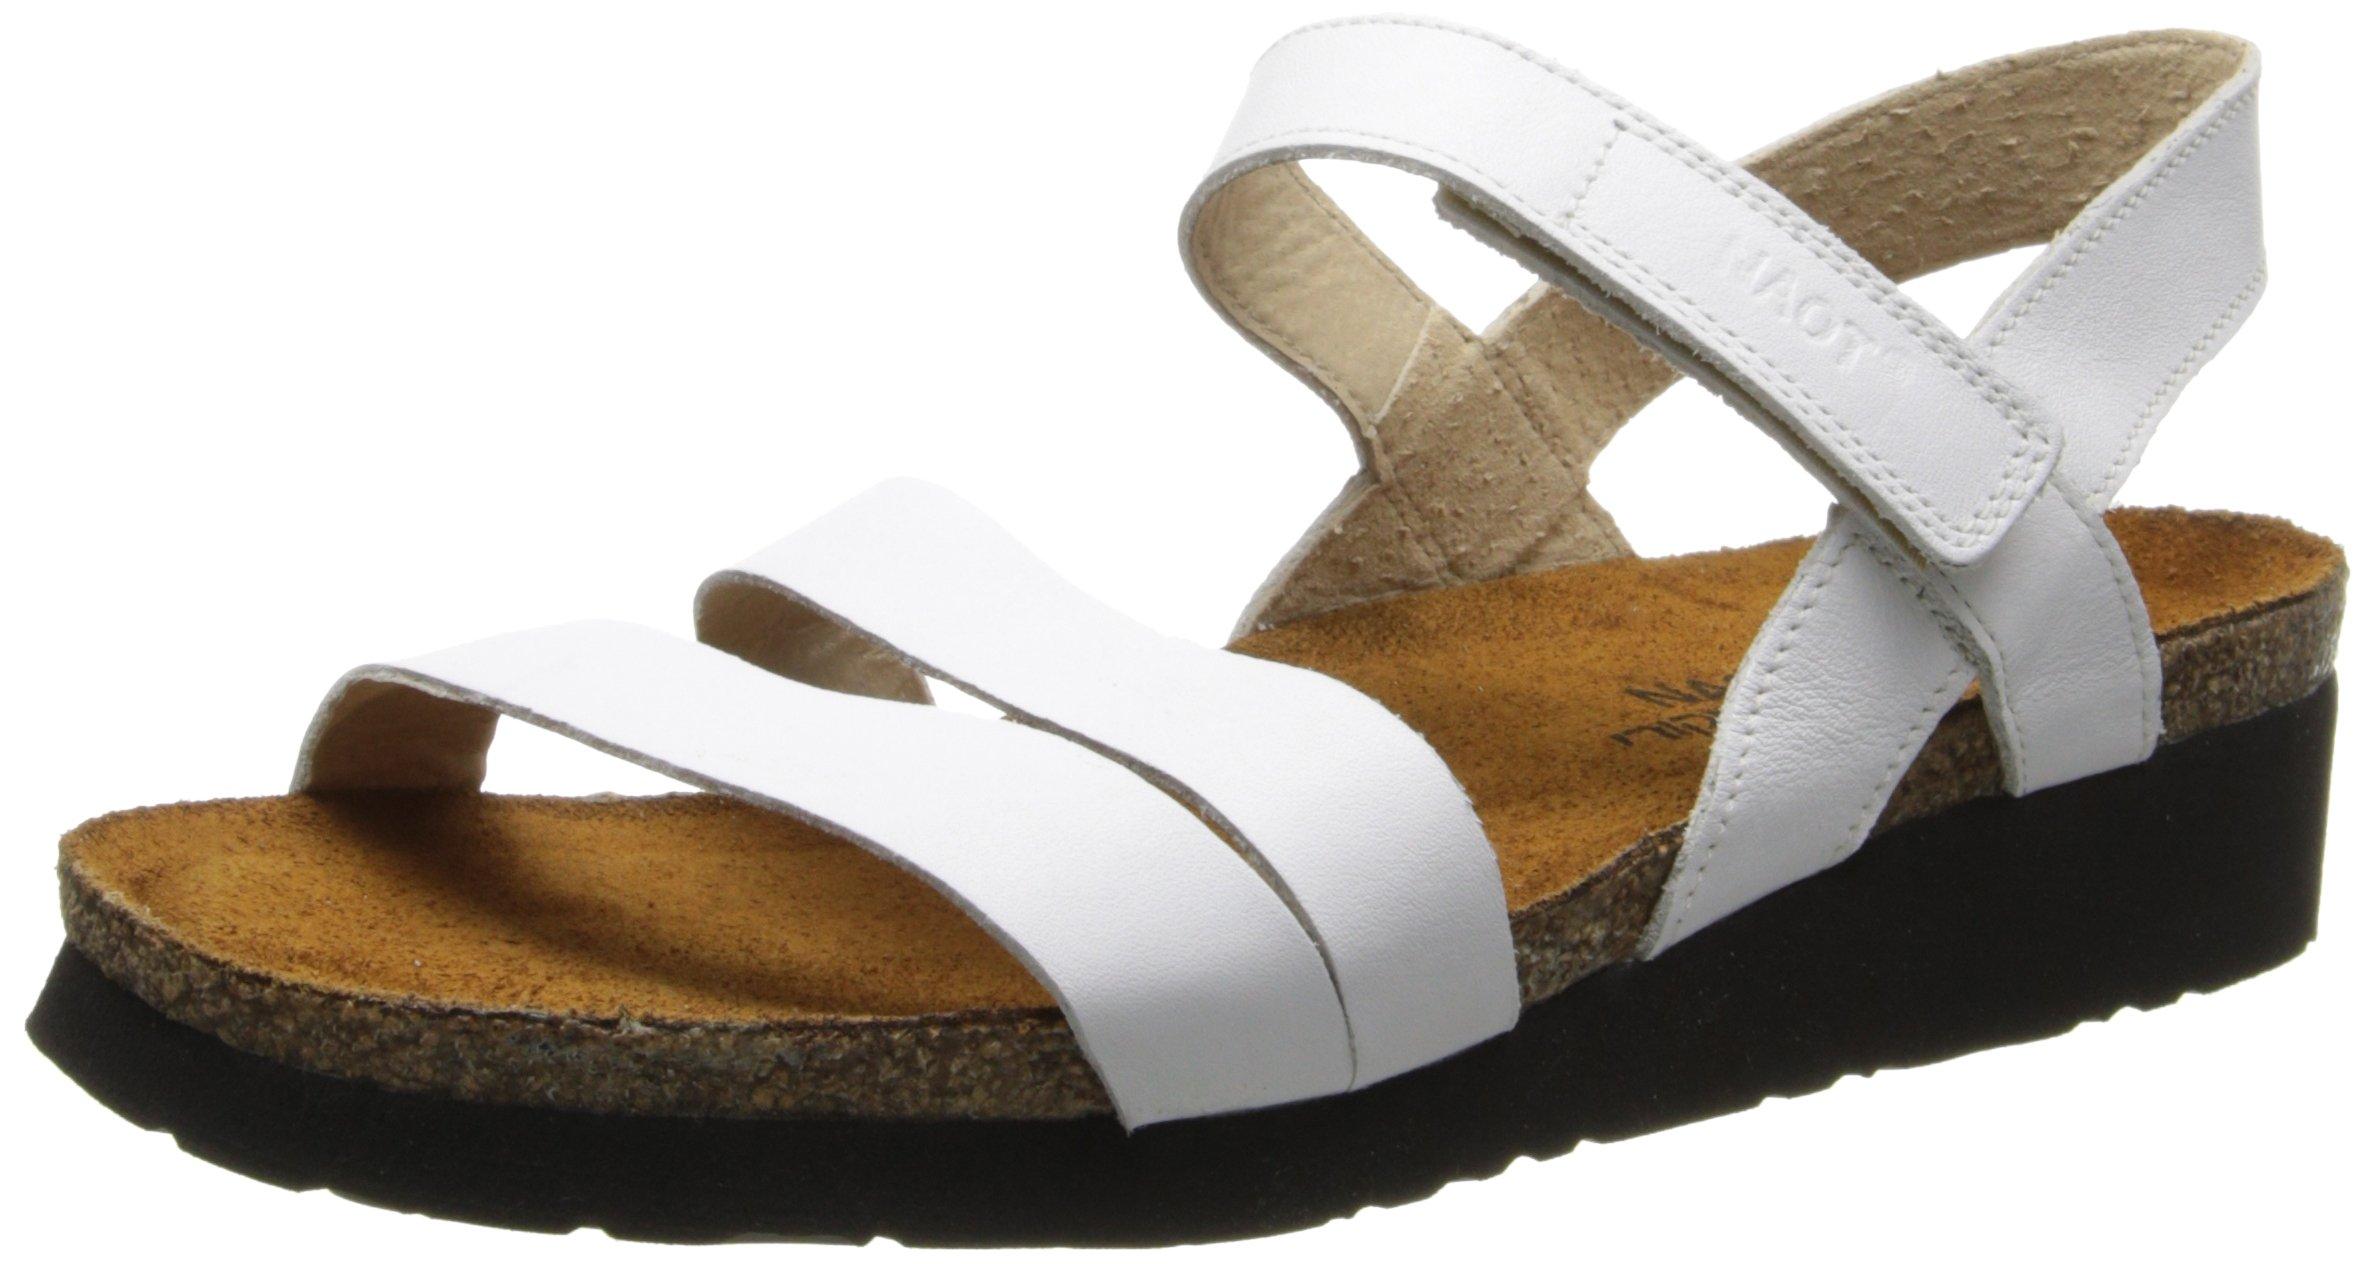 Naot Women's Kayla Wedge Sandal, White Leather, 37 EU/6-6.5 M US